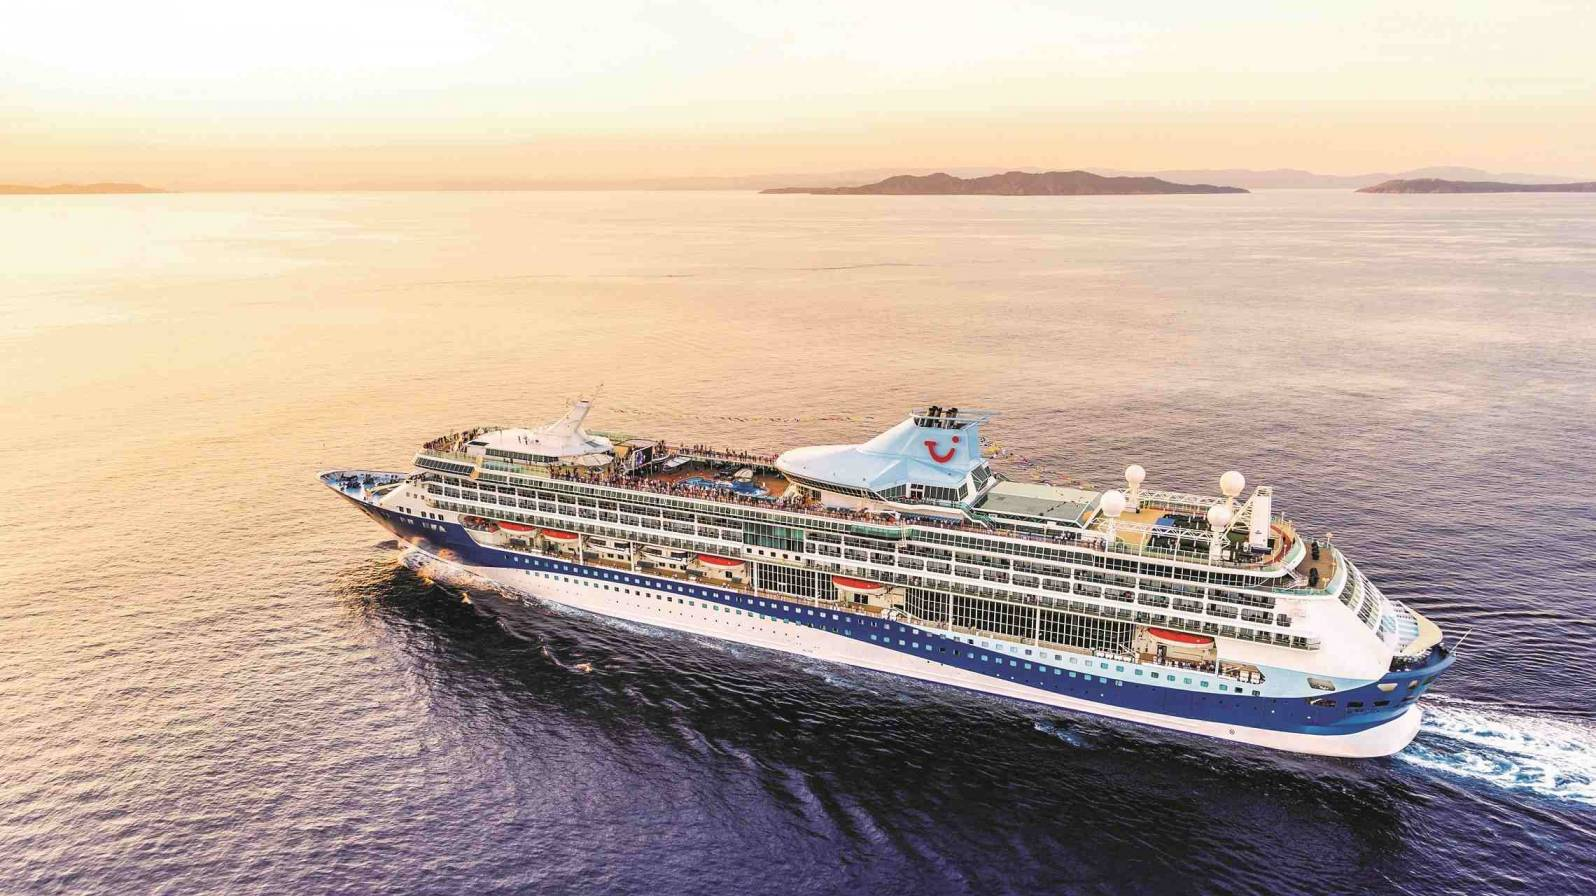 Kristina-Cruises-lomaristeilyt-Marella-Discovery-1596x896.jpg